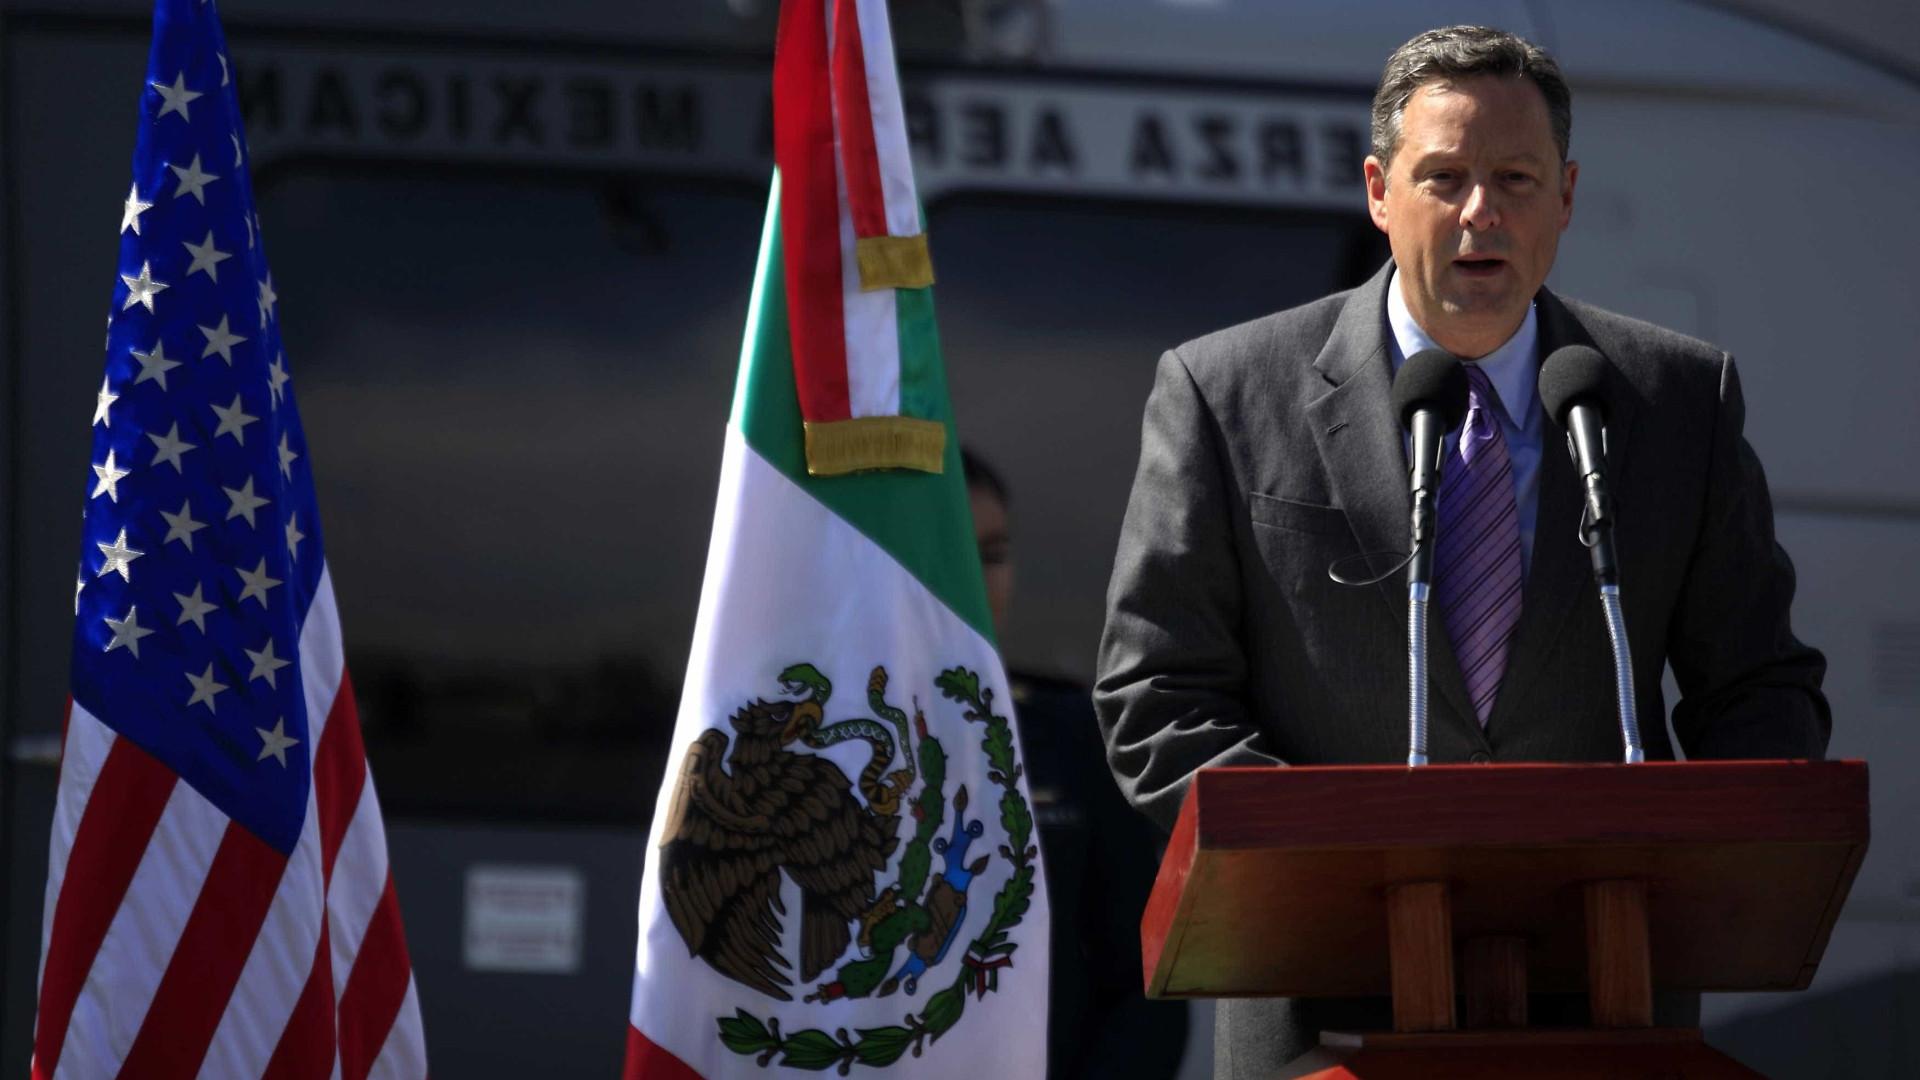 Embaixador dos EUA no Panamá renuncia após palavras de Trump